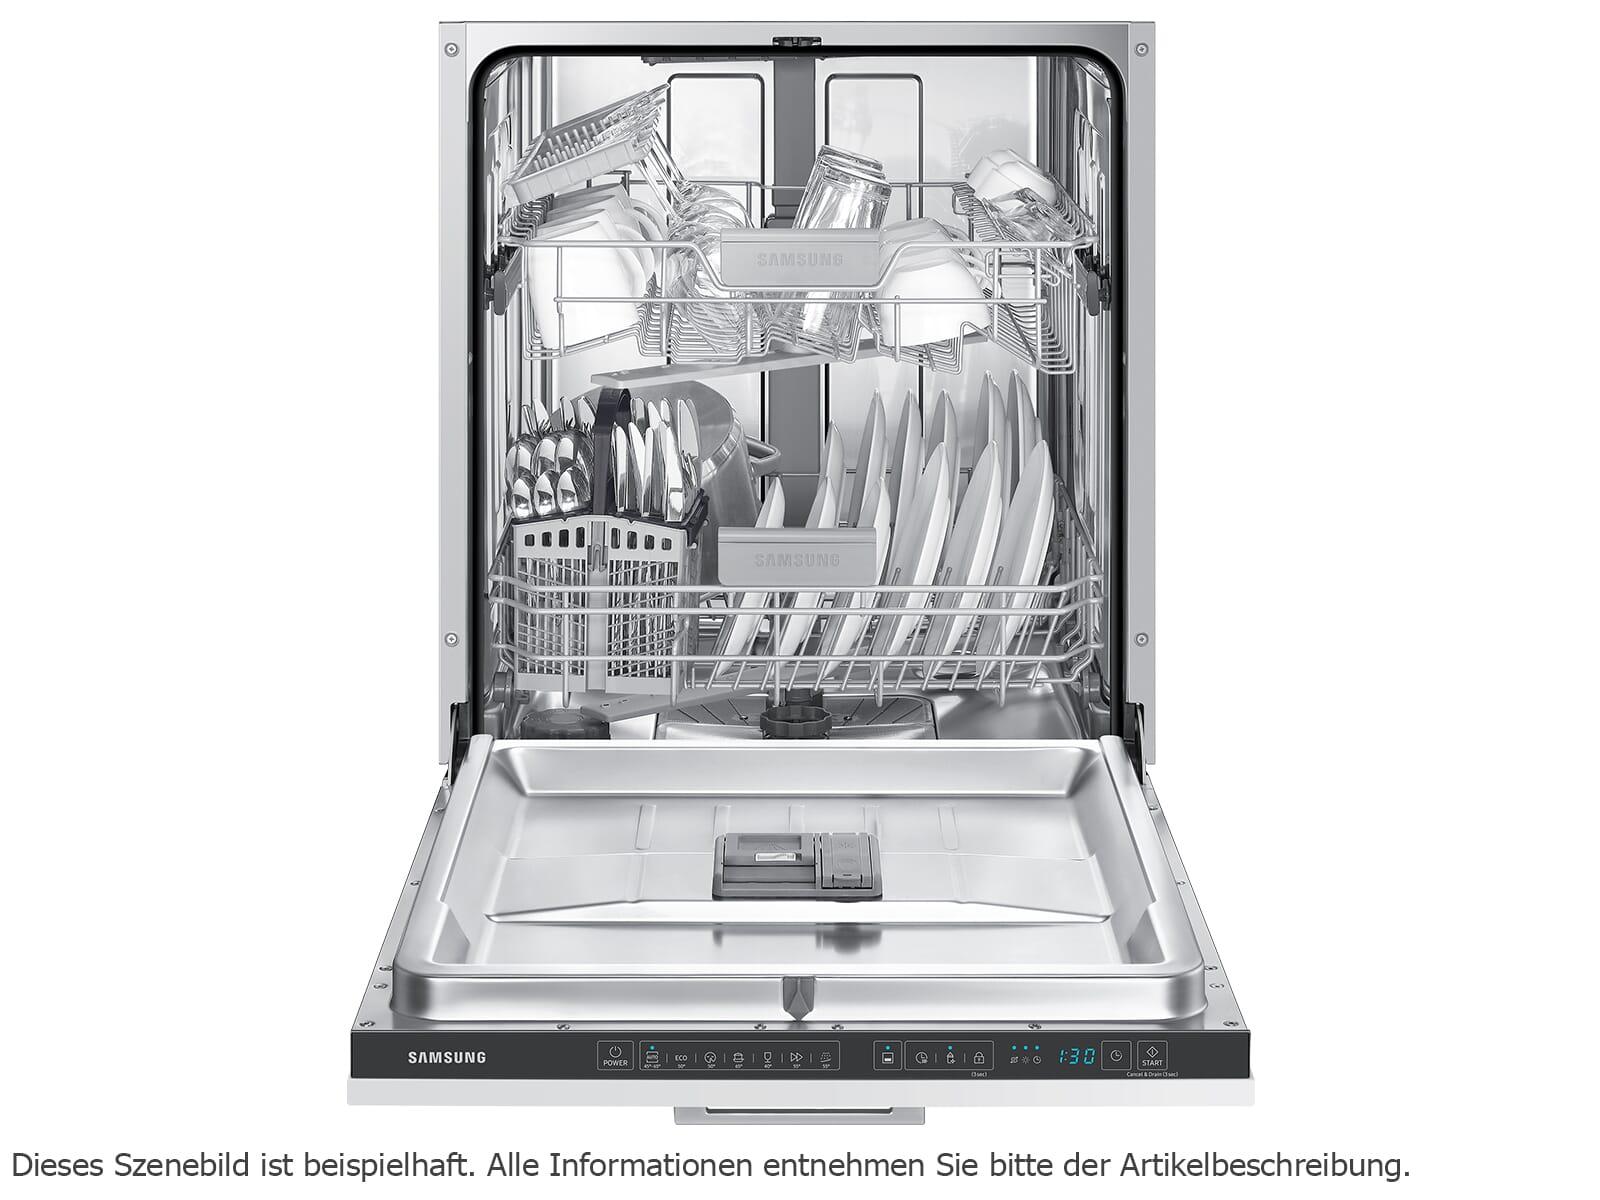 Samsung DW6KR7041BB/EG Vollintegrierbarer Einbaugeschirrspüler